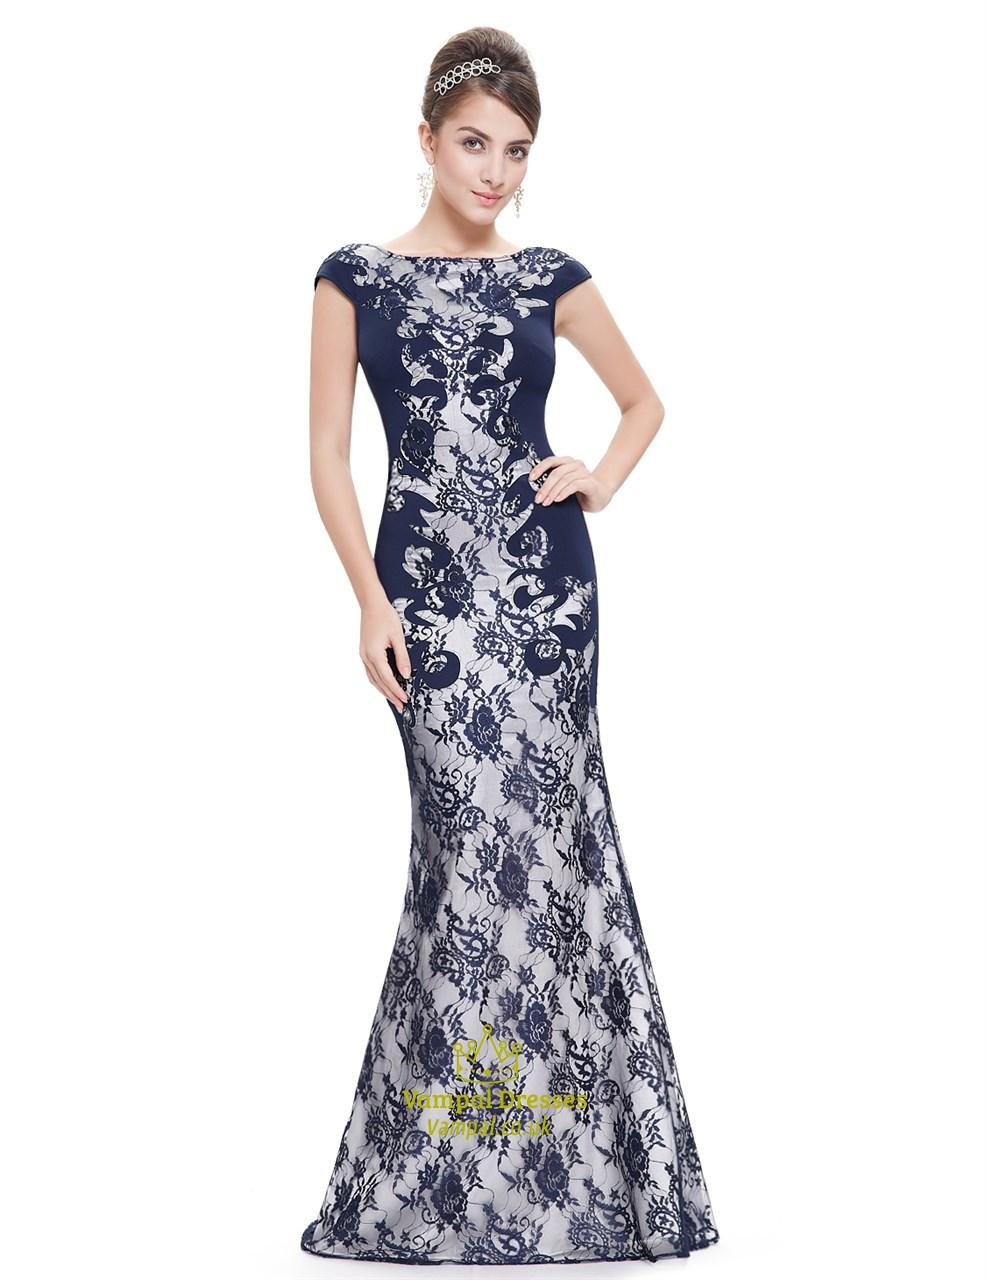 3195b54e1b Elegant Navy Blue Mermaid Lace Prom Dress With Cap Sleeves SKU -NW1584